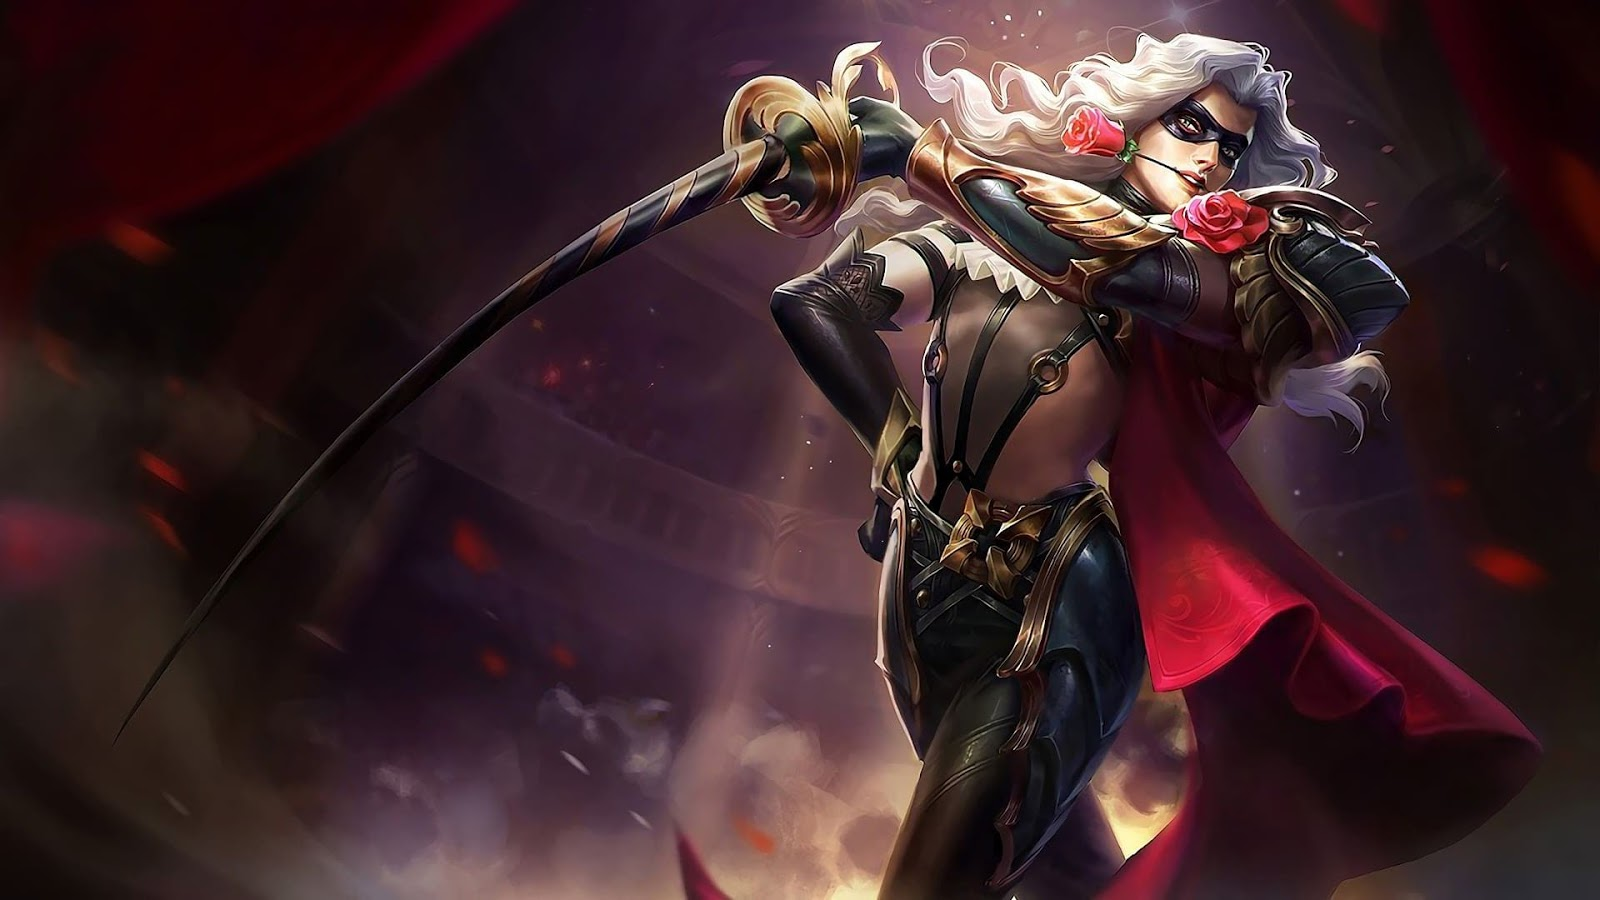 Wallpaper Lancelot Masked Knight Skin Mobile Legends HD for PC